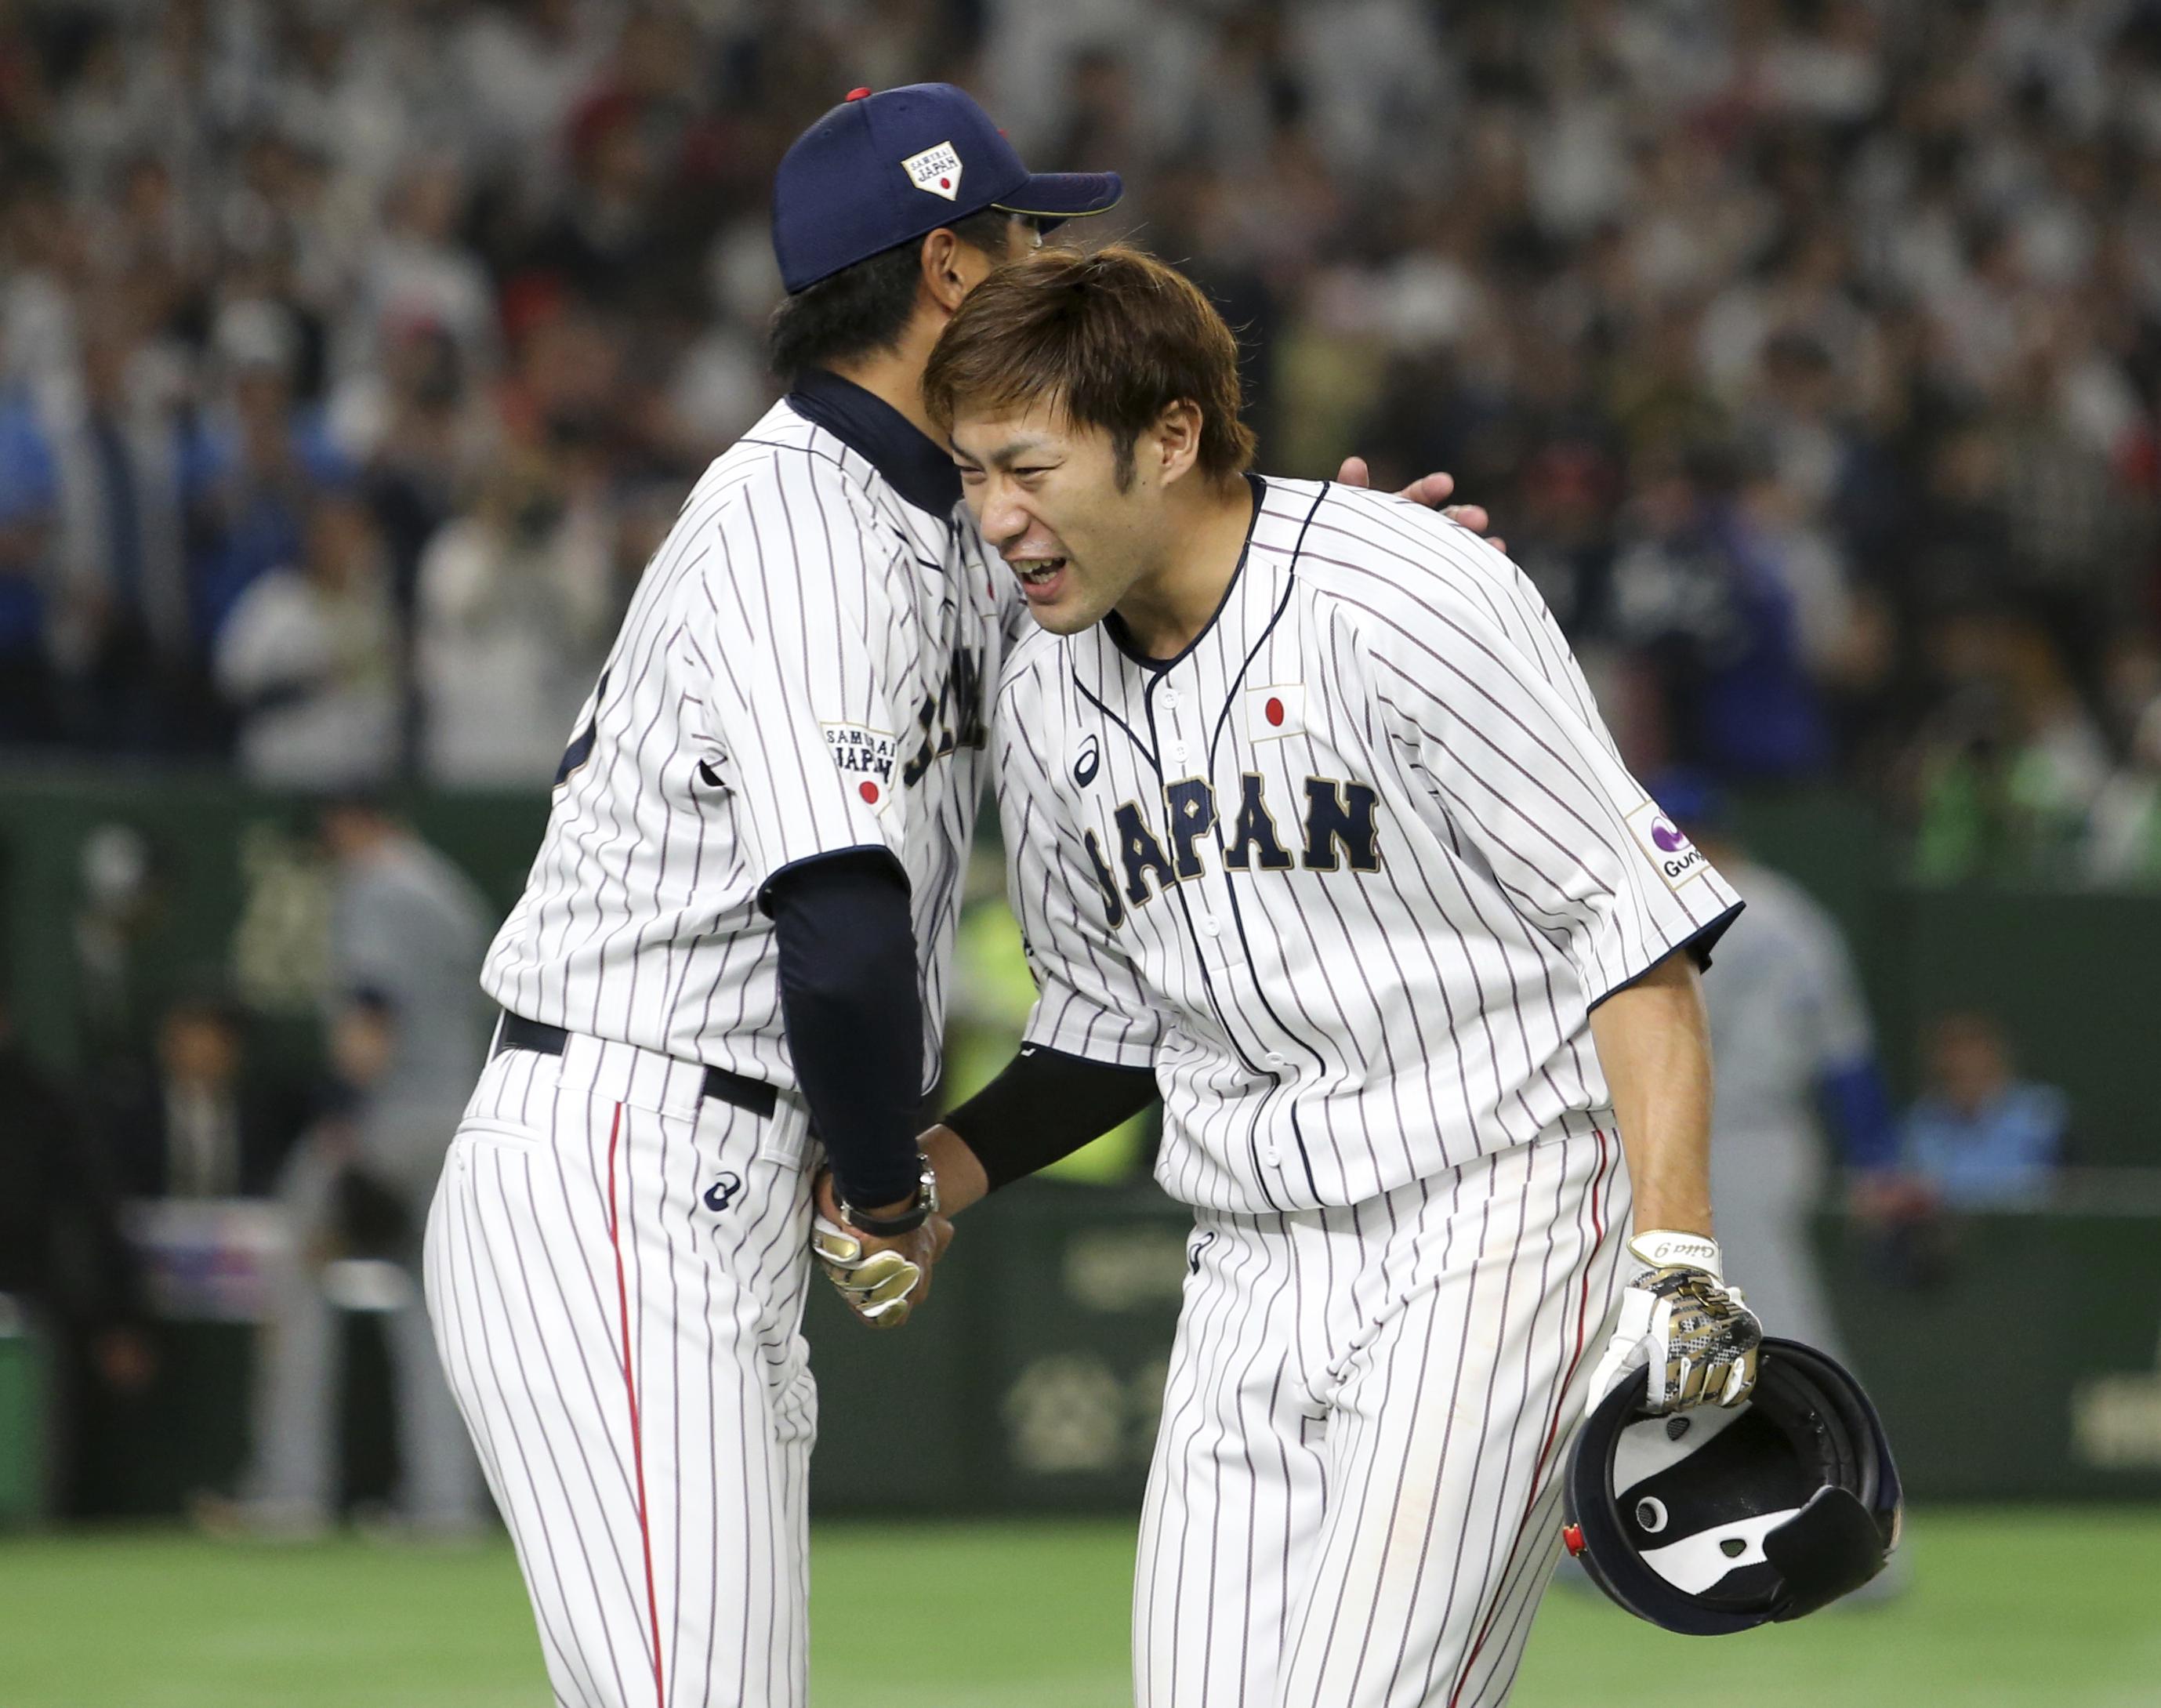 Yanagita's HR off Yates lift Japan over MLB in tour opener